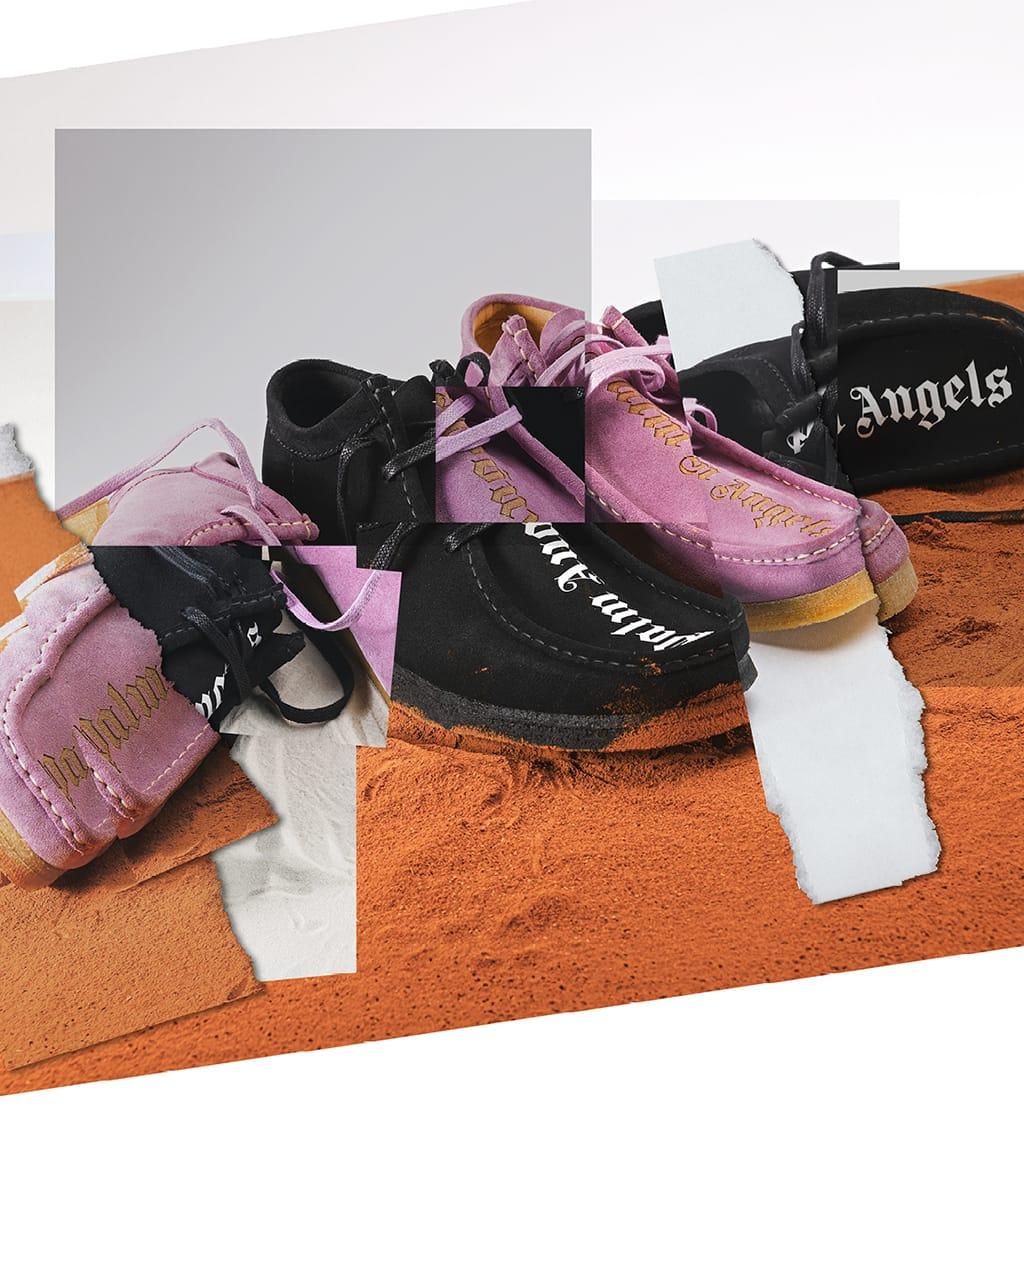 Palm Angels x Clarks Wallabee FW20 Shoe